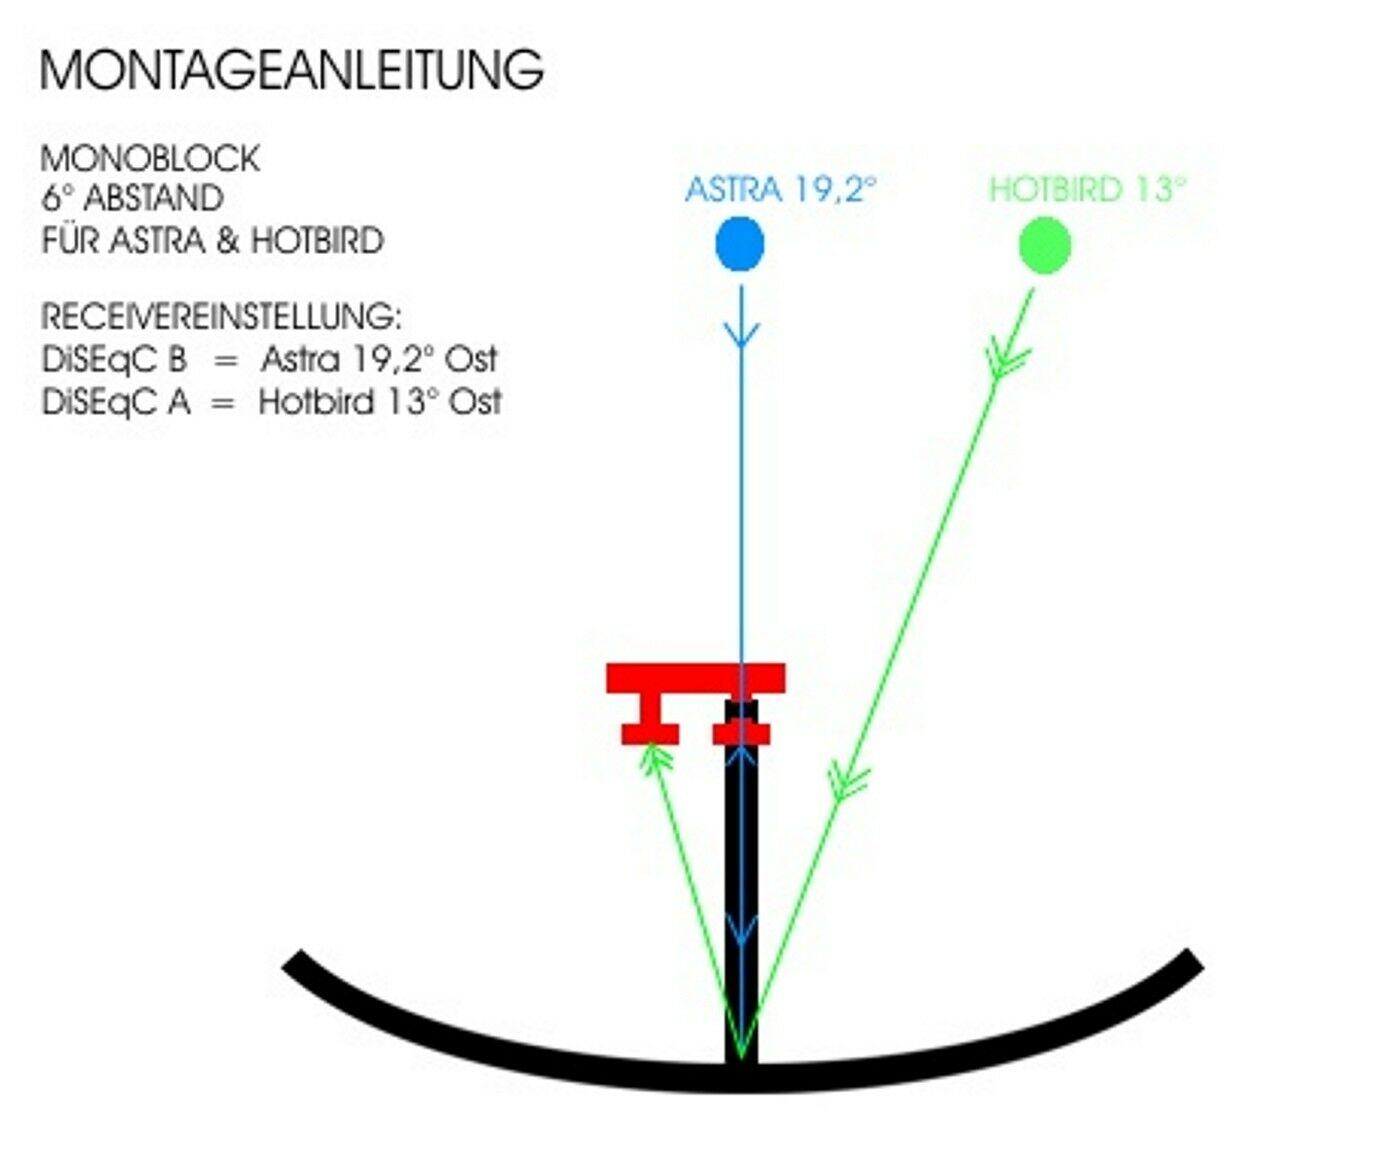 Inverto Black Monoblock 6° Single LNB 0.2dB für 19° Astra & 13° Hotbird